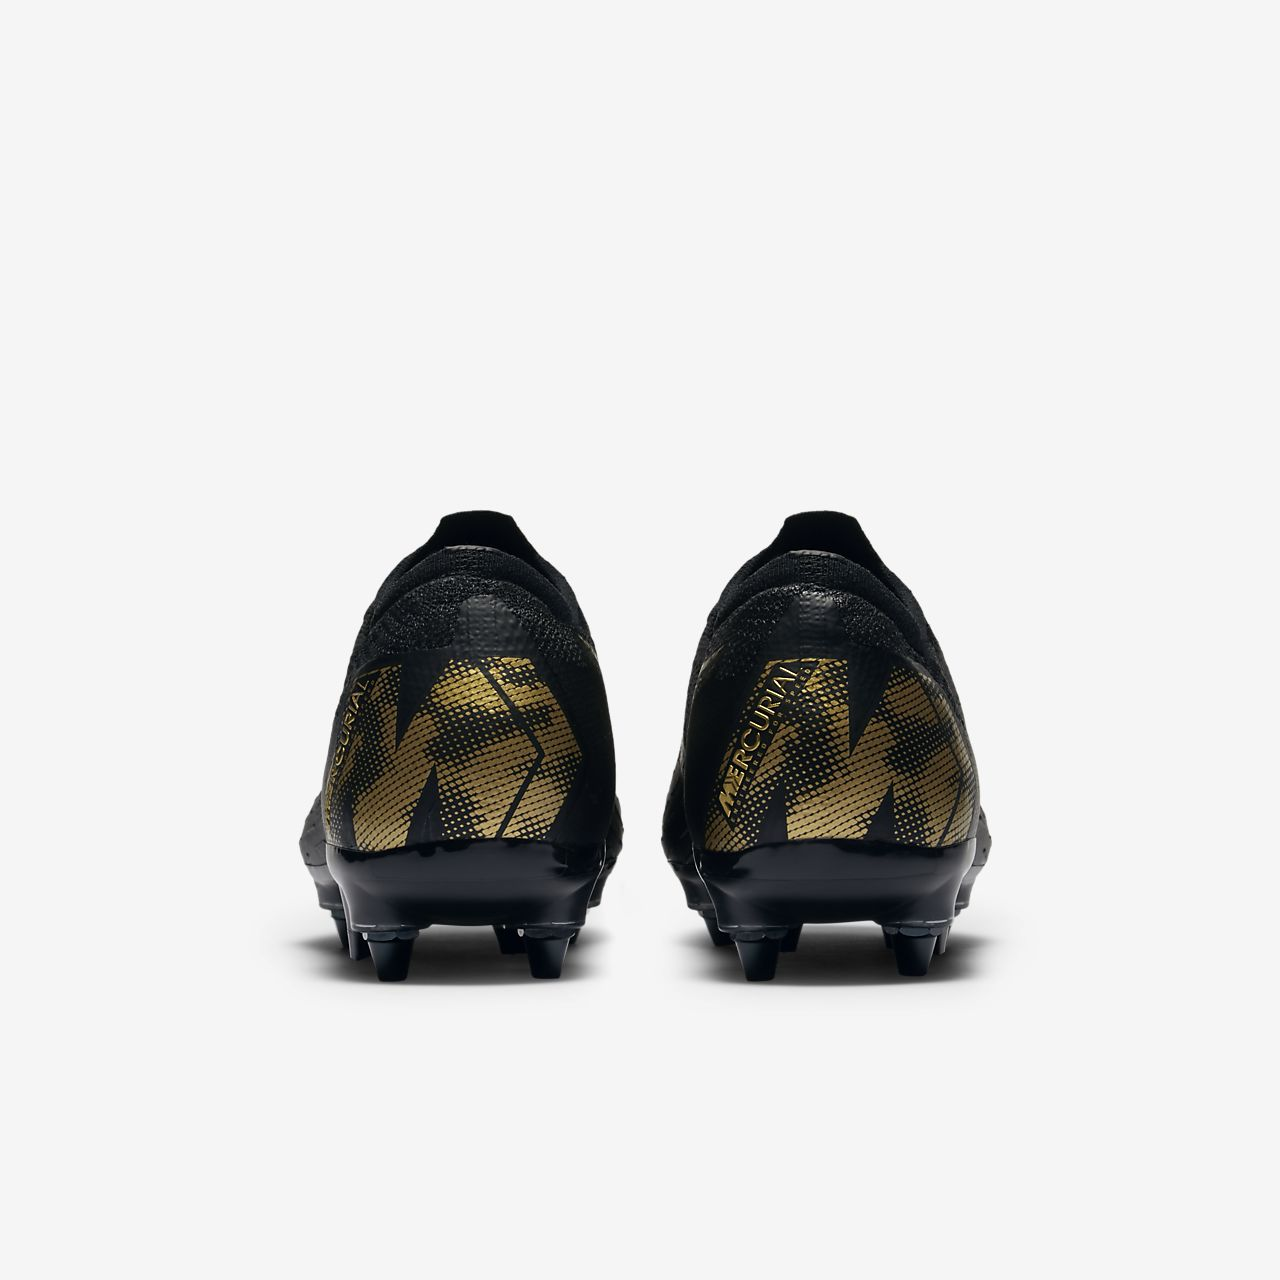 ffcd12c51893 ... Nike Mercurial Vapor 360 Elite SG-PRO Anti-Clog Soft-Ground Football  Boot